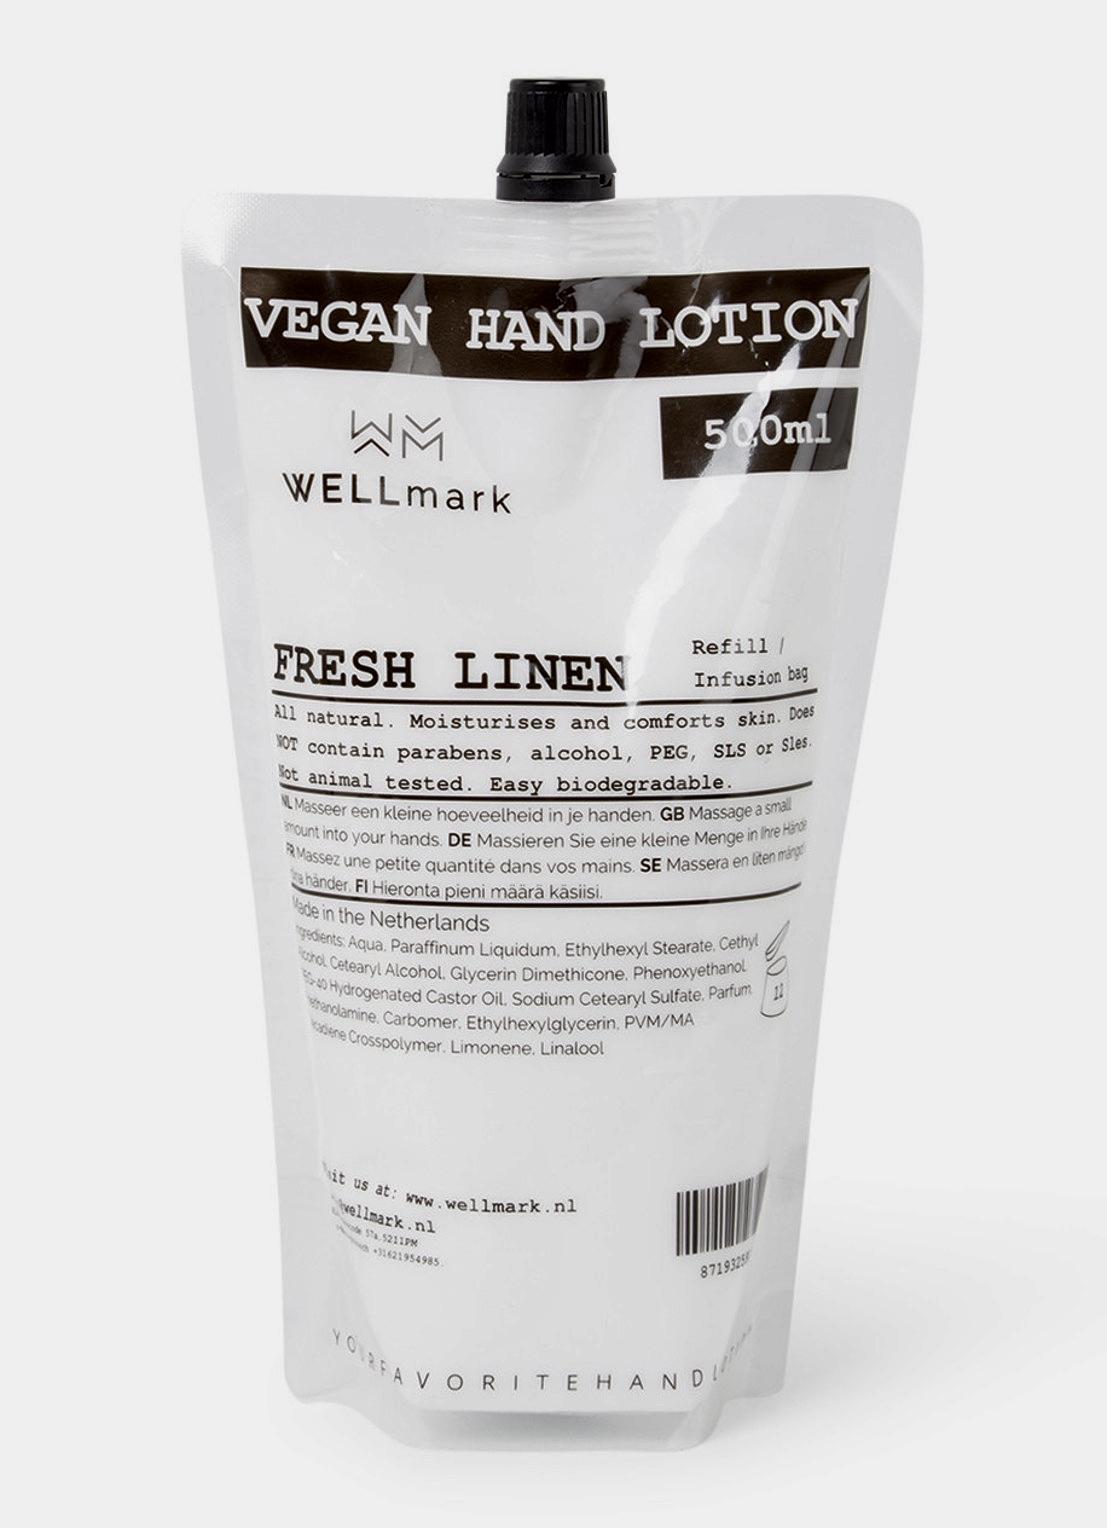 Fresh Linen Vegan Hand Lotion 500 ml by Wellmark